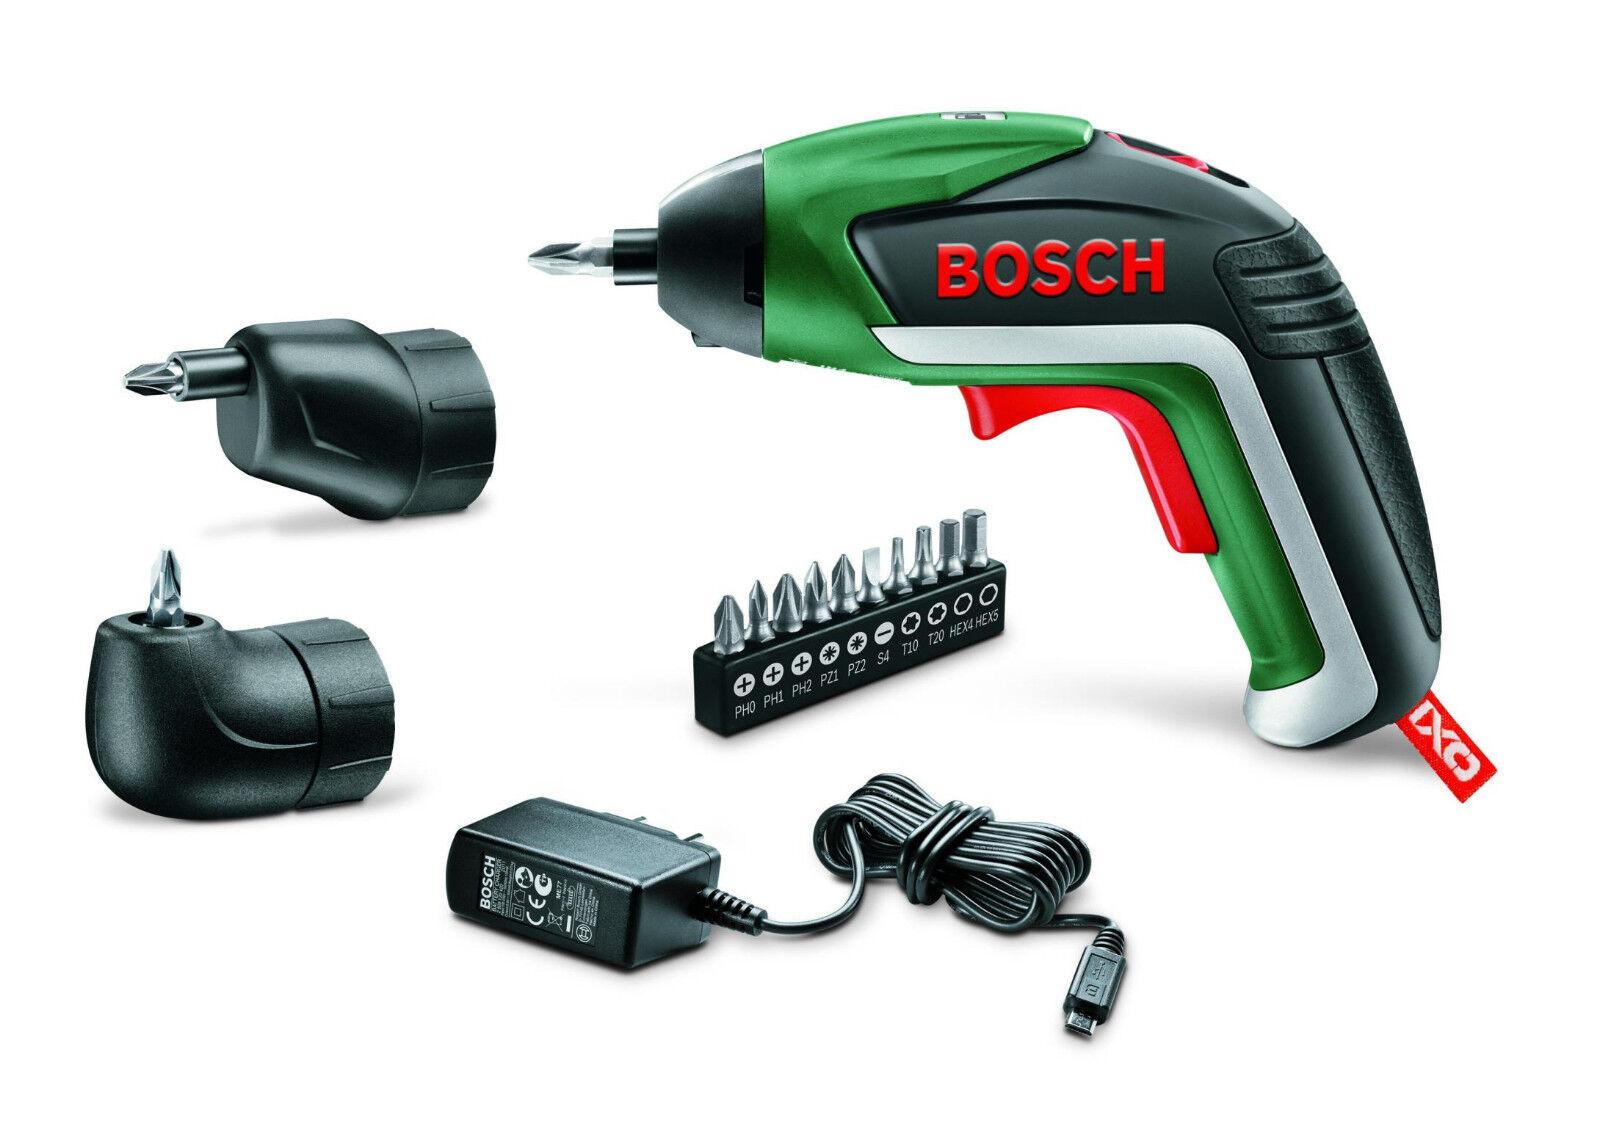 Bosch Akku-Schrauber IXO V Set 3,6 V inkl. Ladegerät + 10-teiliges Bit-Set